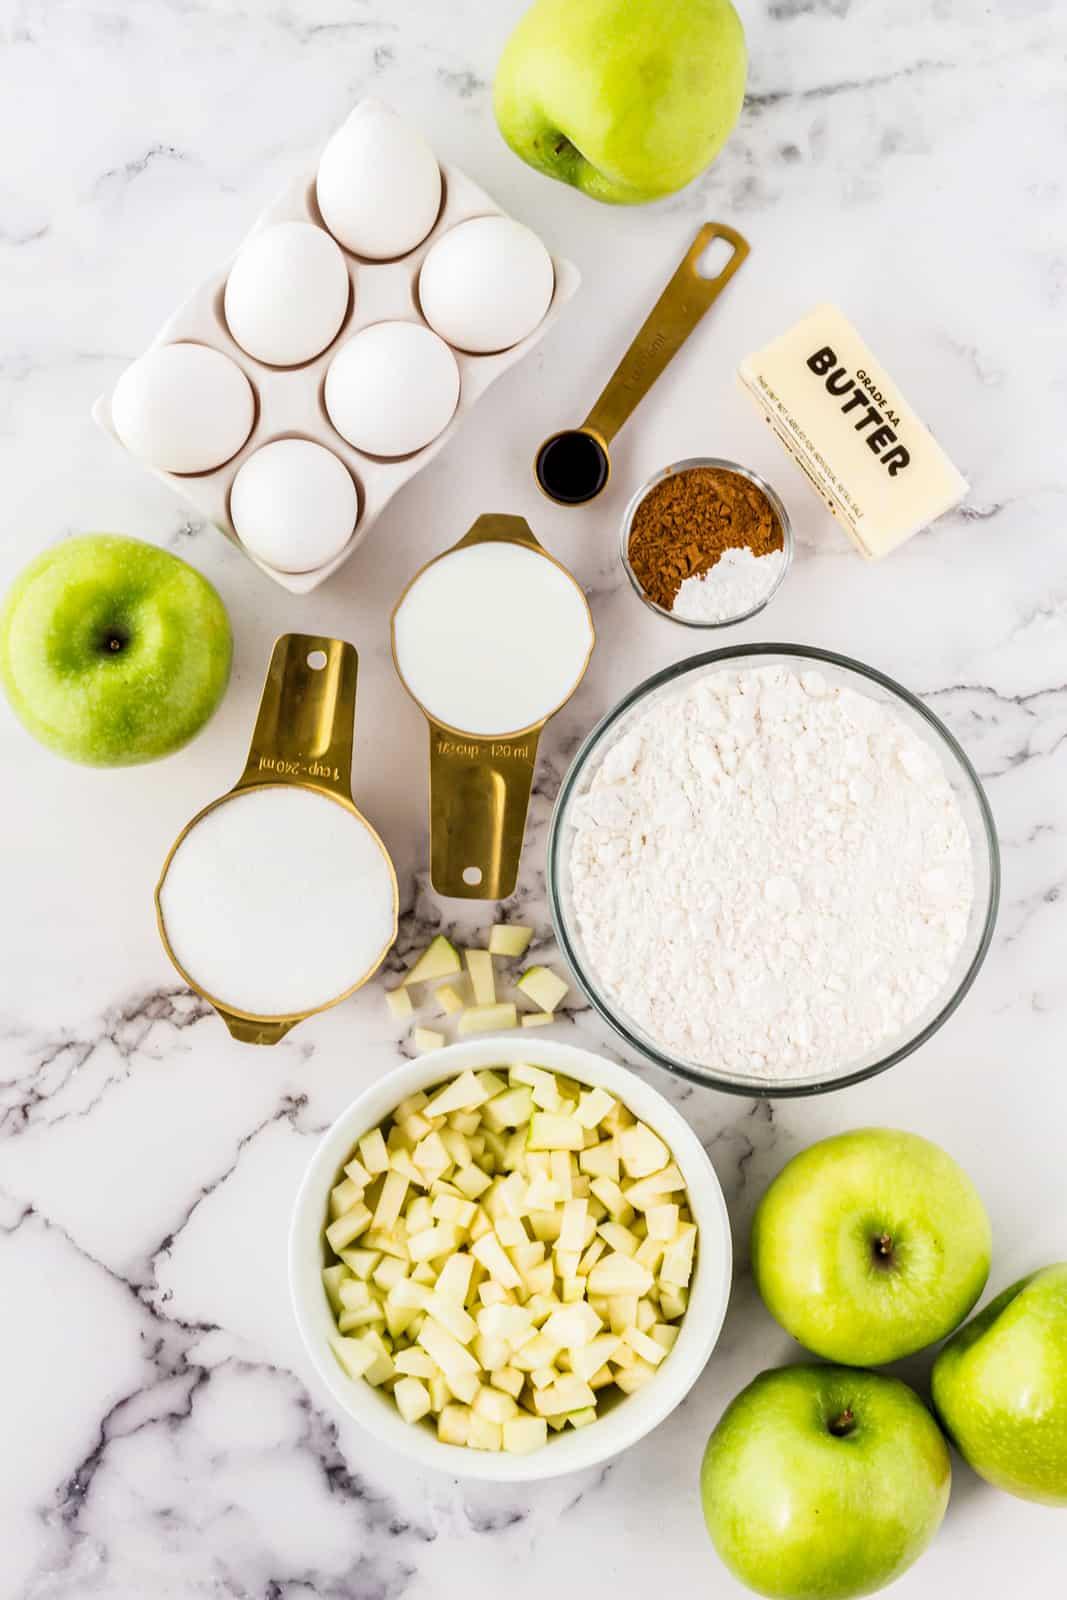 Ingredients needed to make Apple Cinnamon Muffins.